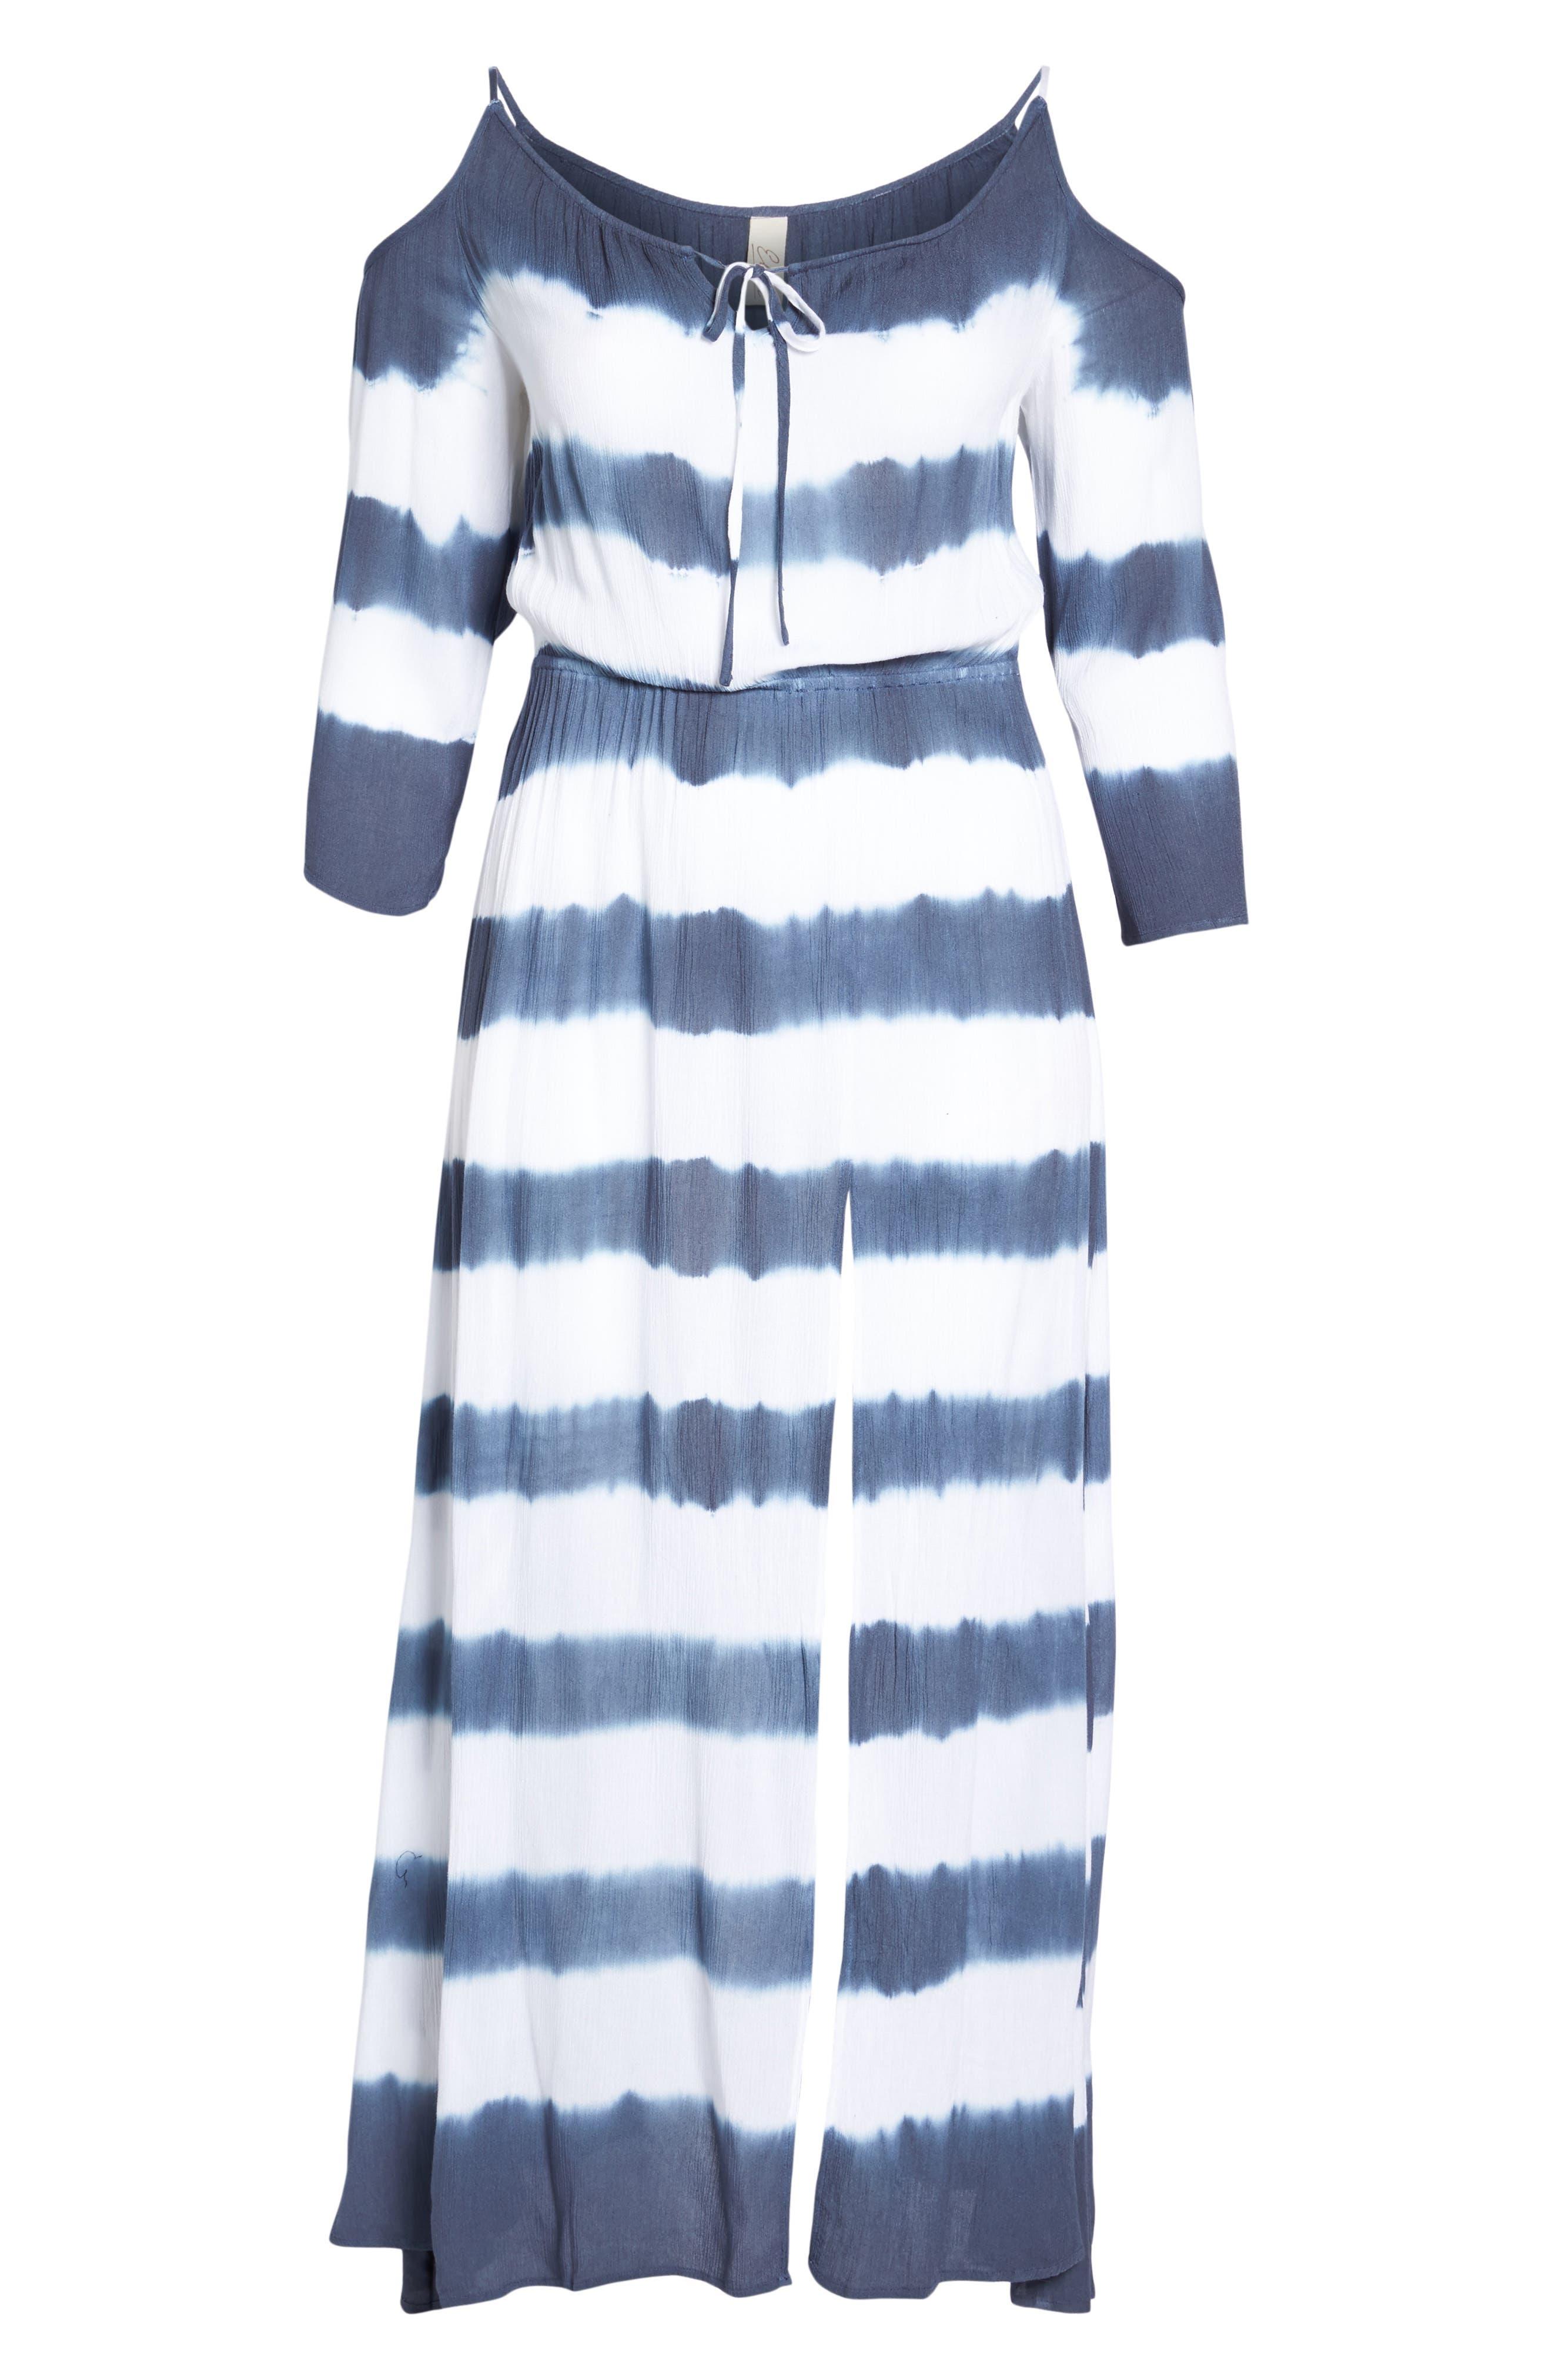 Cold Shoulder Cover-Up Maxi Dress,                             Alternate thumbnail 6, color,                             Td Indigo/ White